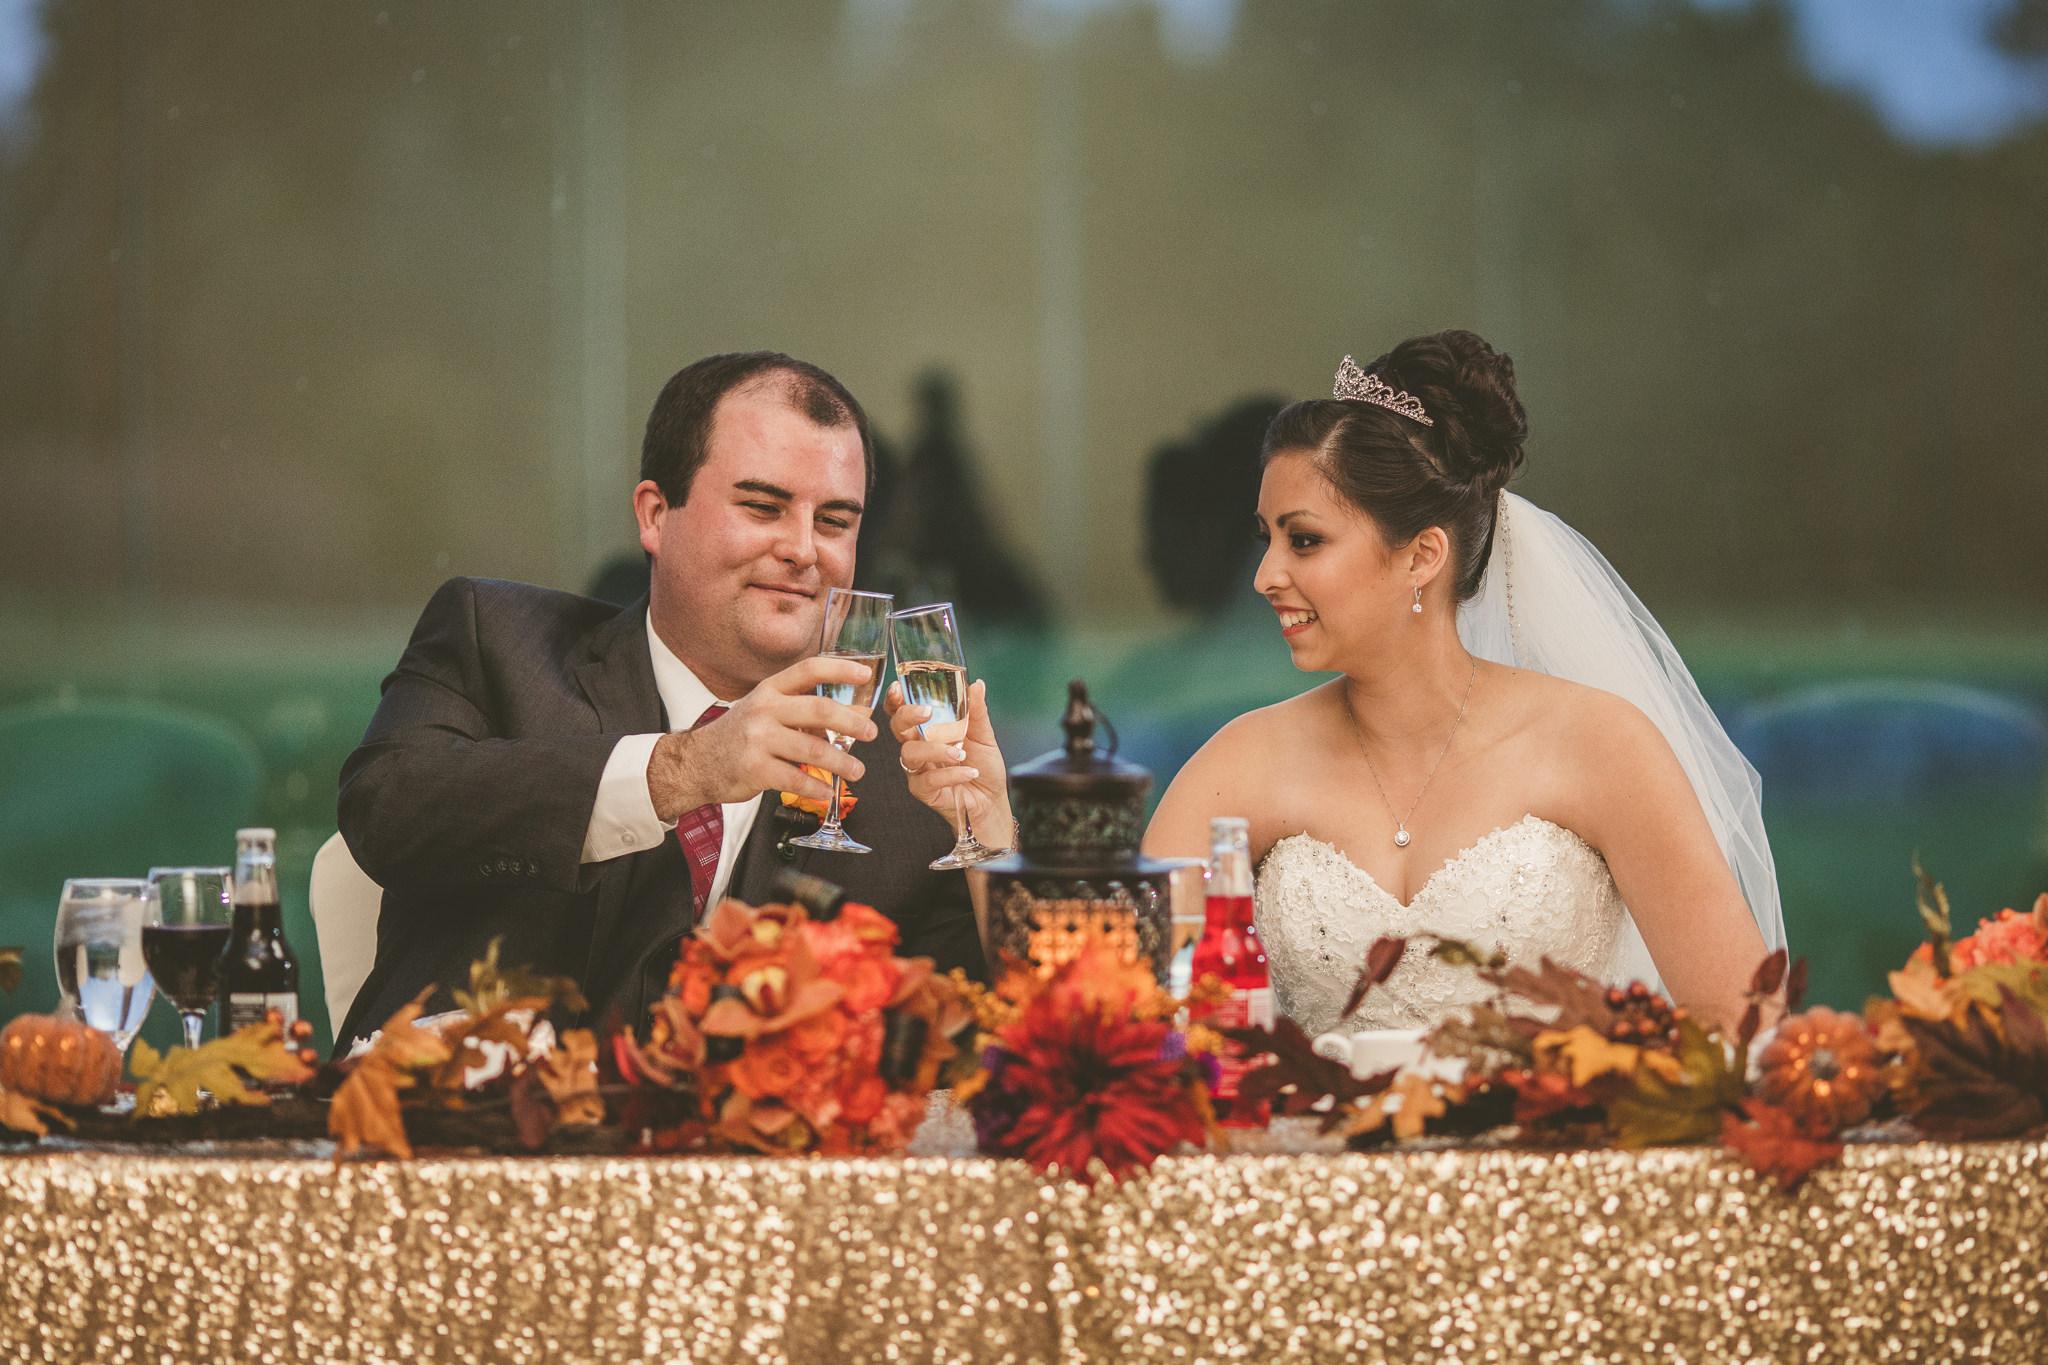 deer creek banquet facility wedding photos 693 - Deer Creek Wedding Photos